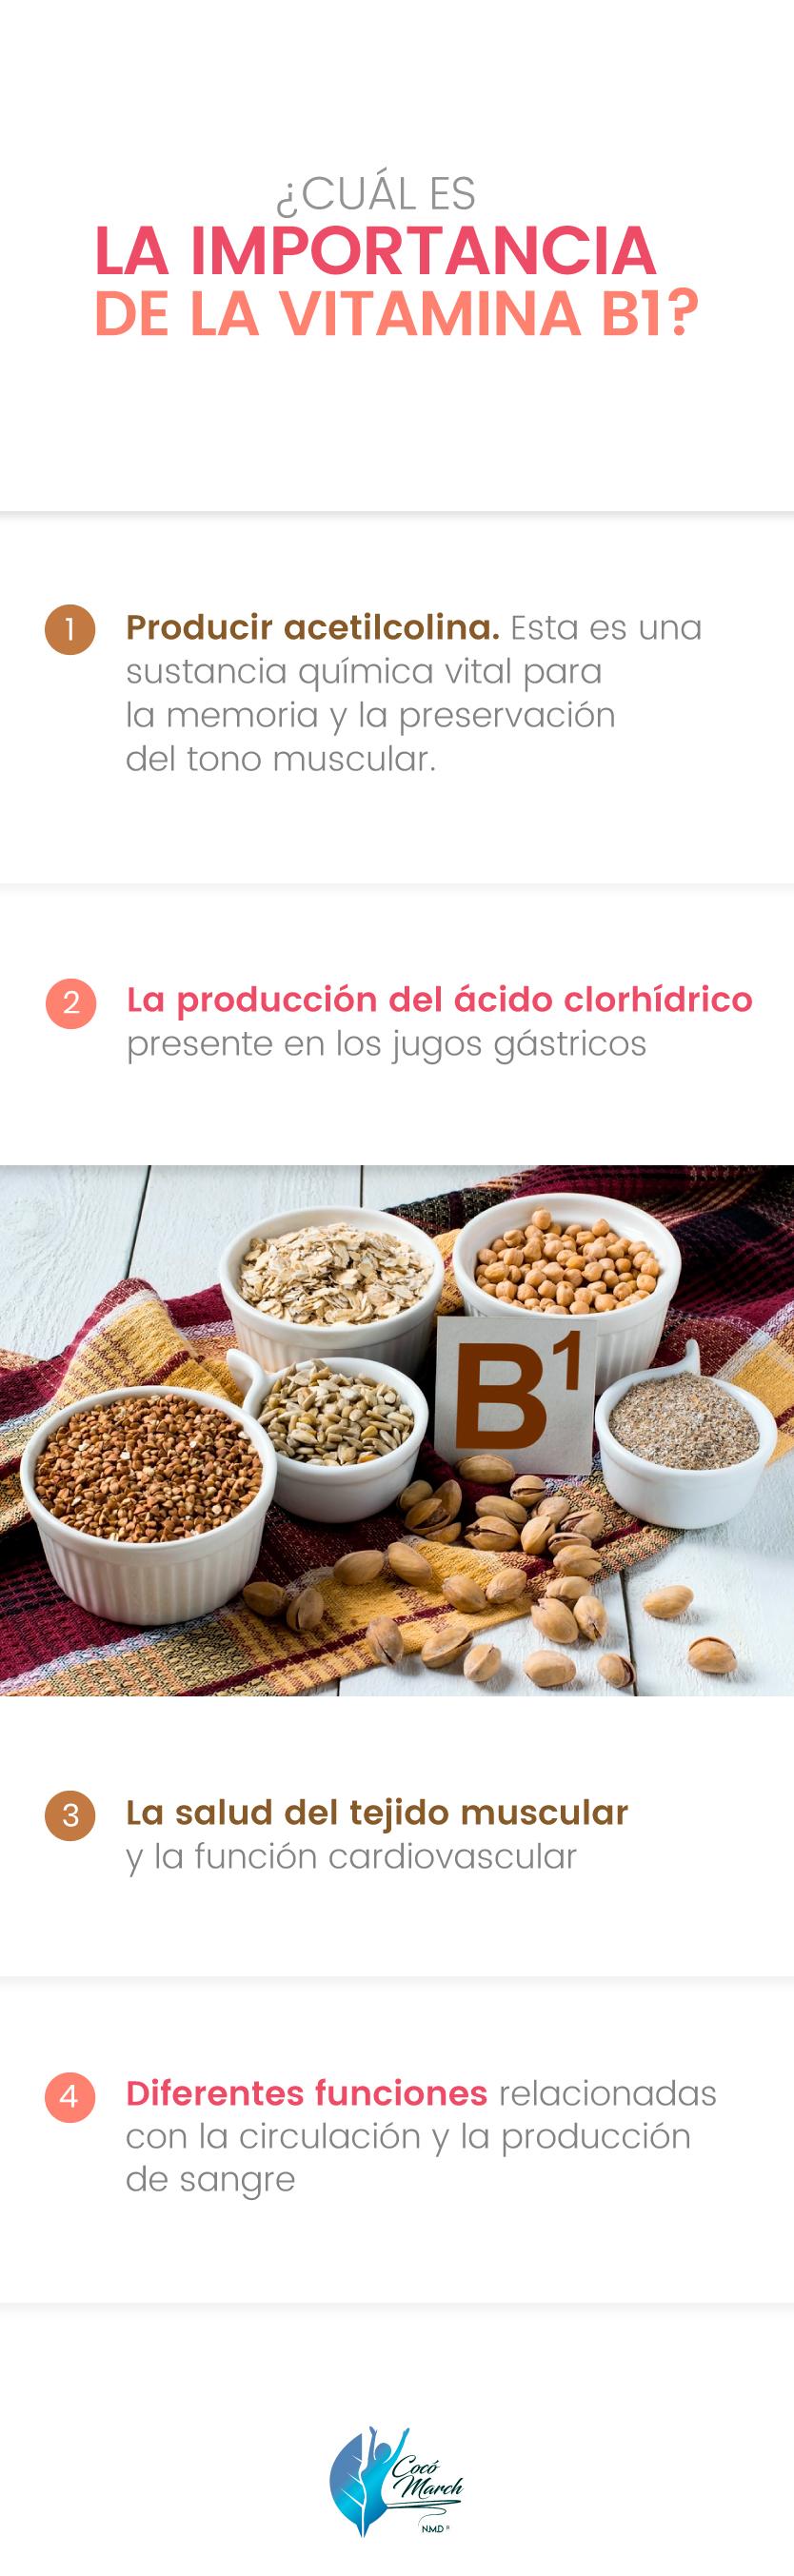 vitamina-b1-importancia